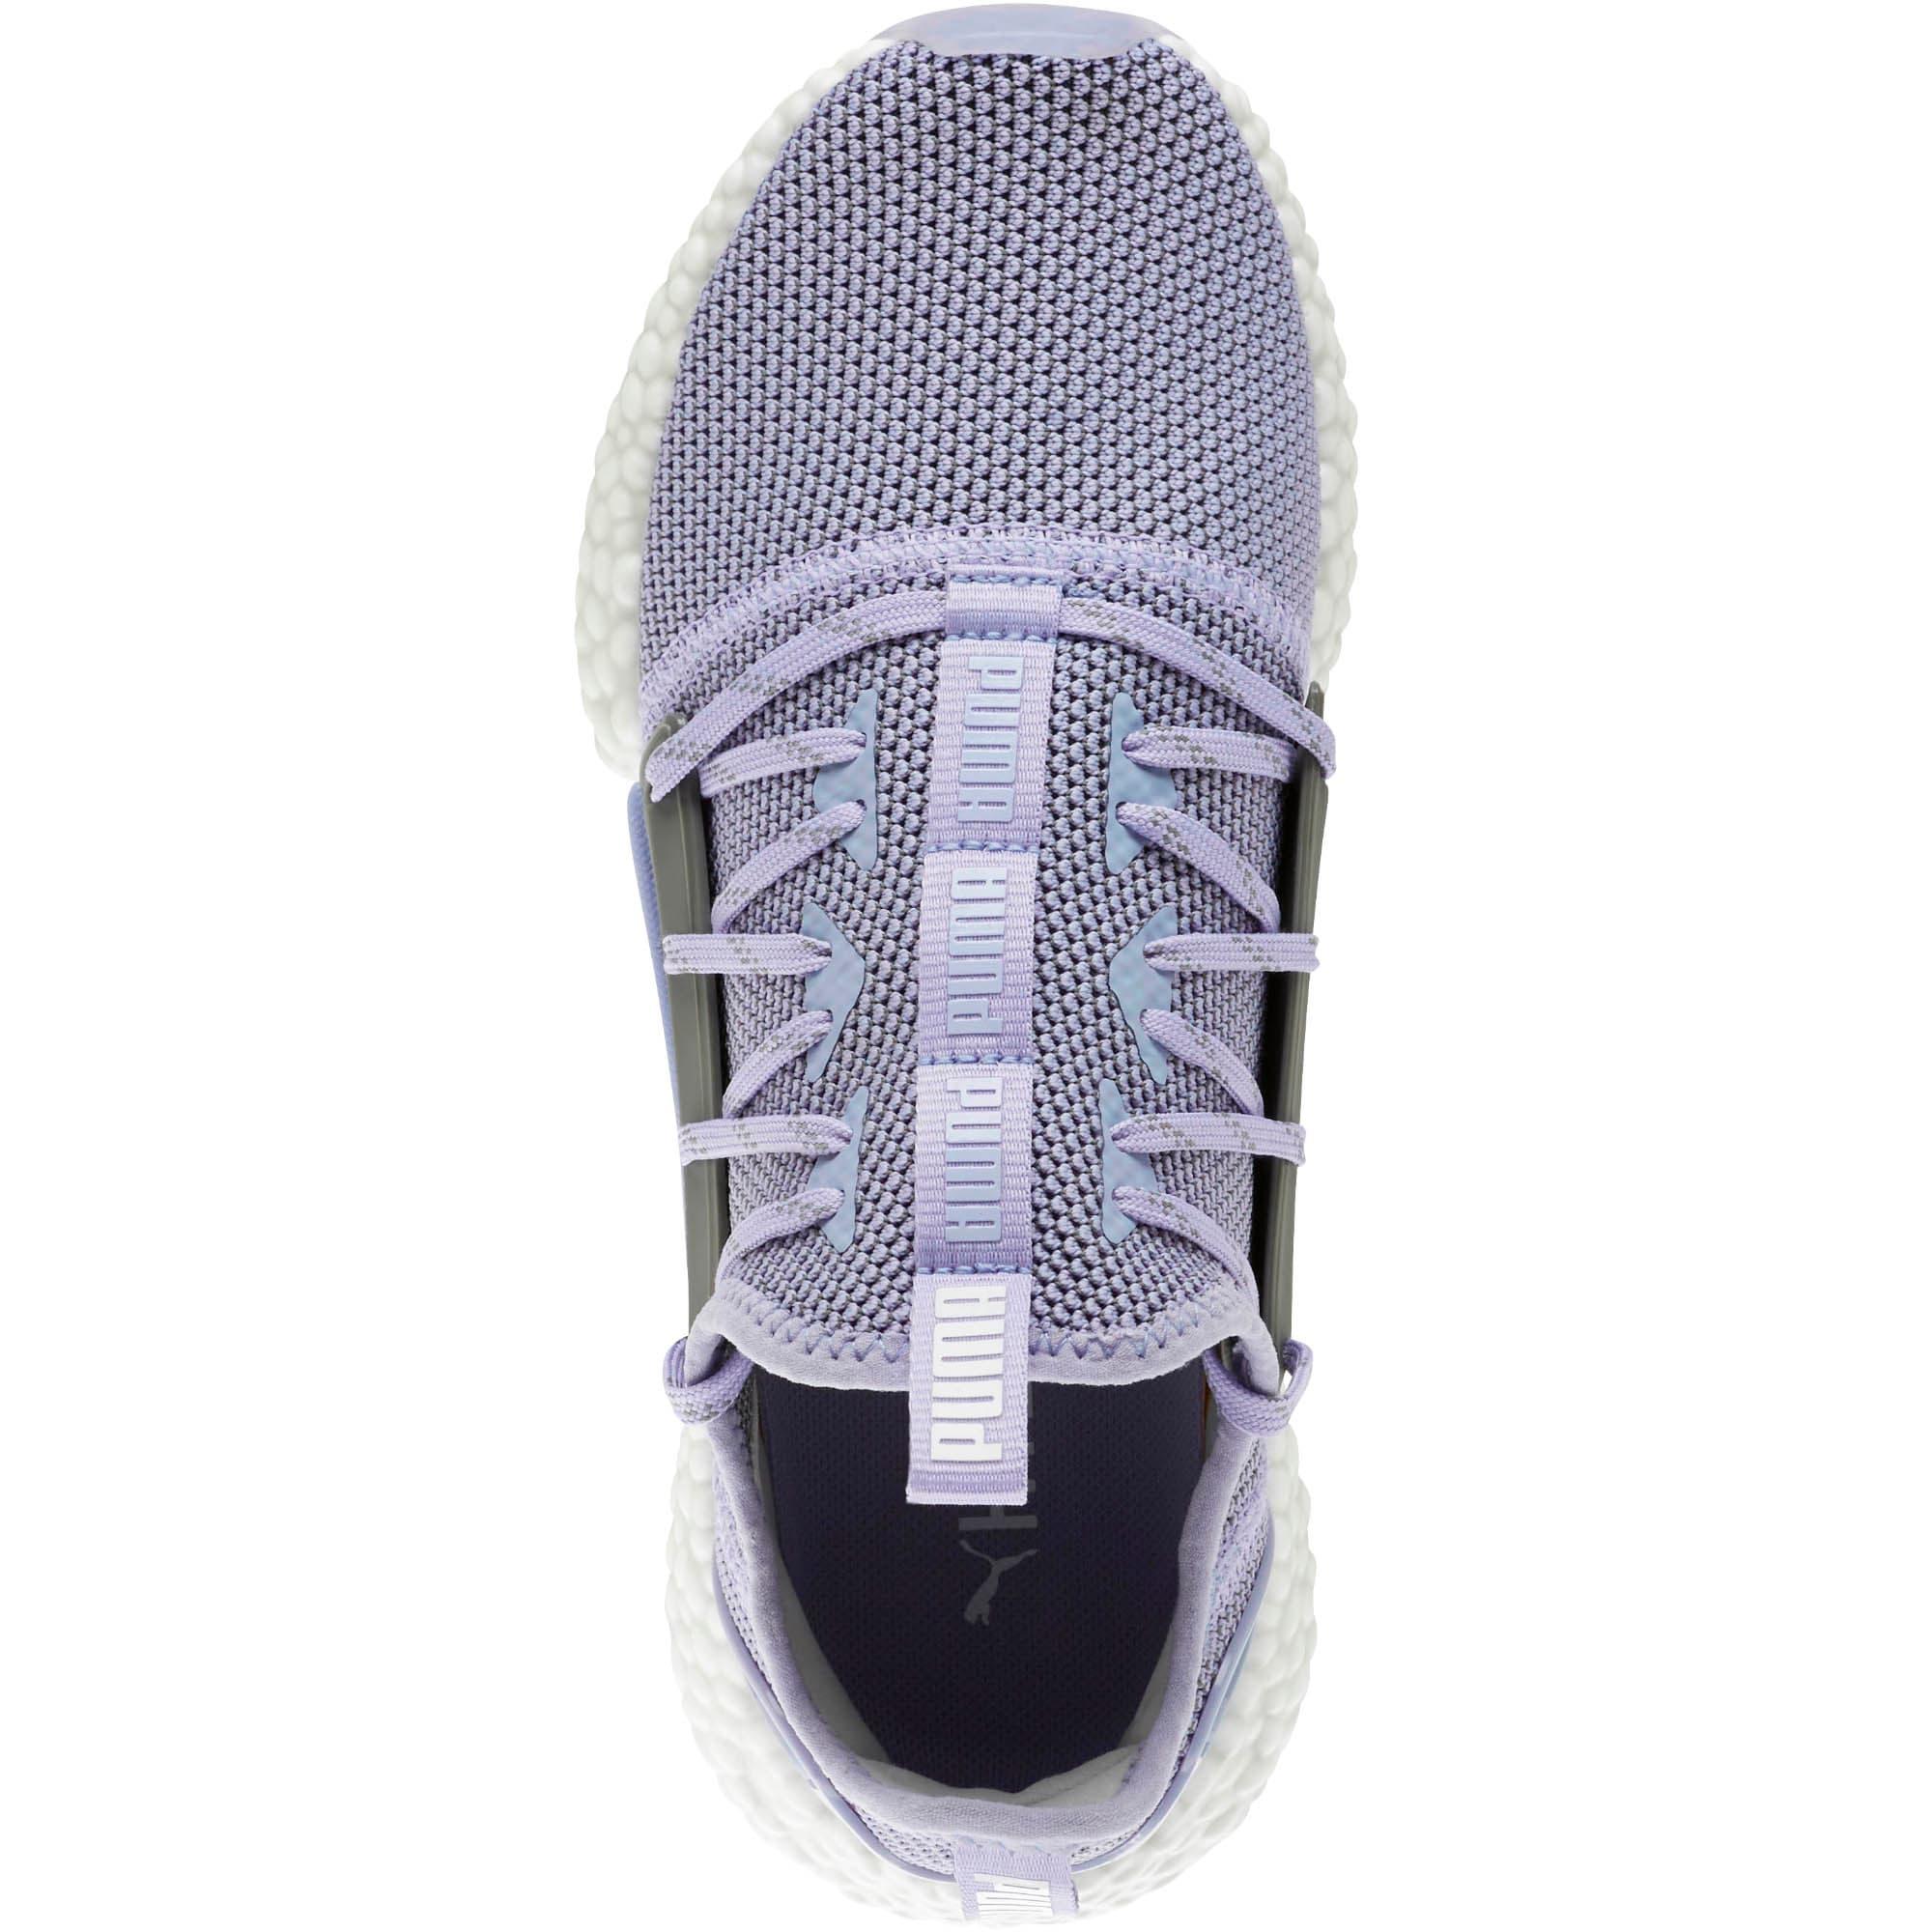 Thumbnail 5 of HYBRID Rocket Runner Women's Running Shoes, Sweet Lavender-Puma White, medium